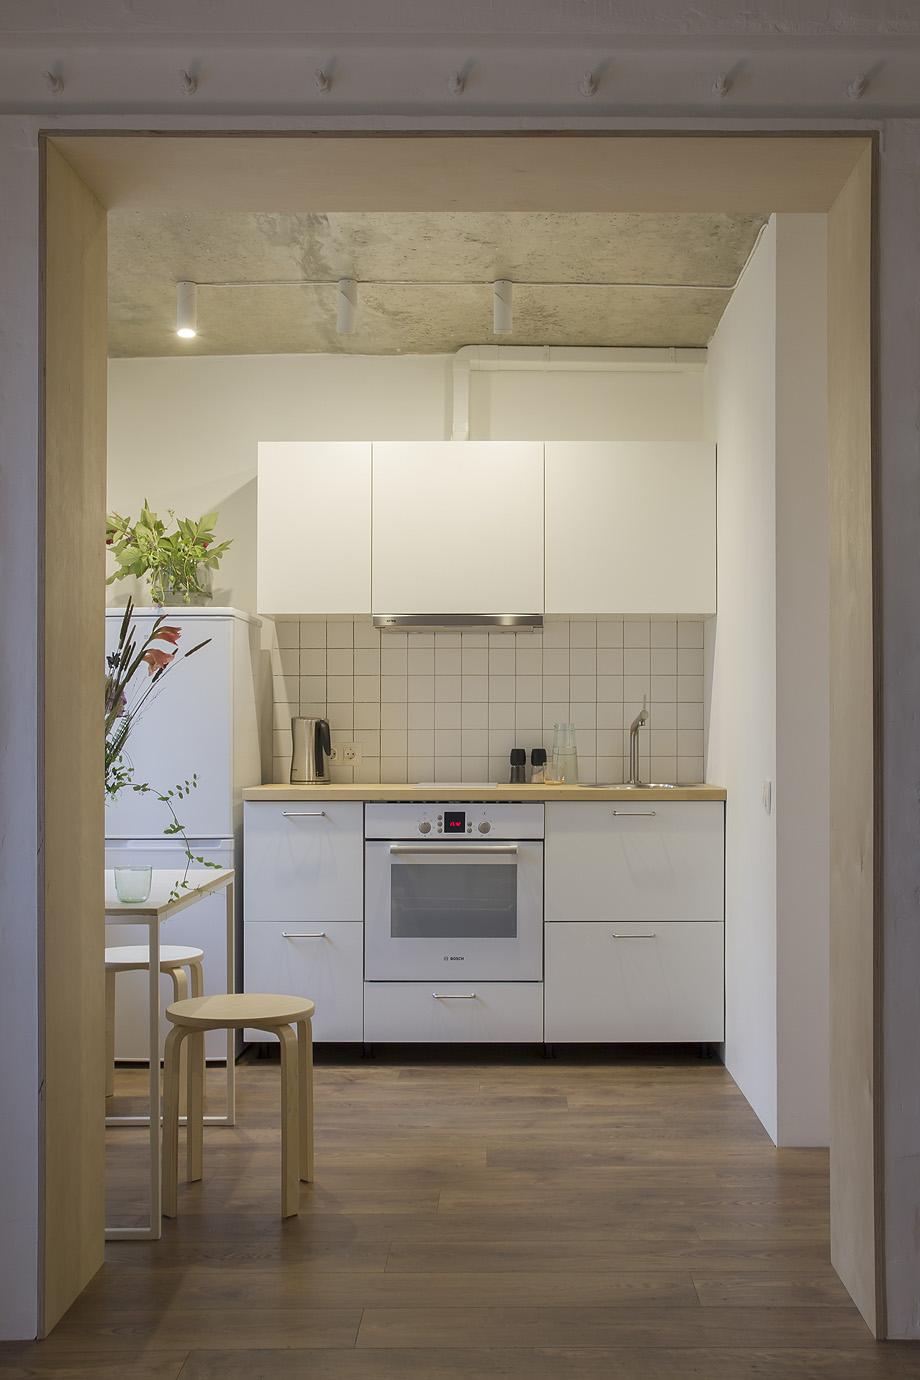 apartamento en rusia por kdva architects - foto daria koloskova (22)